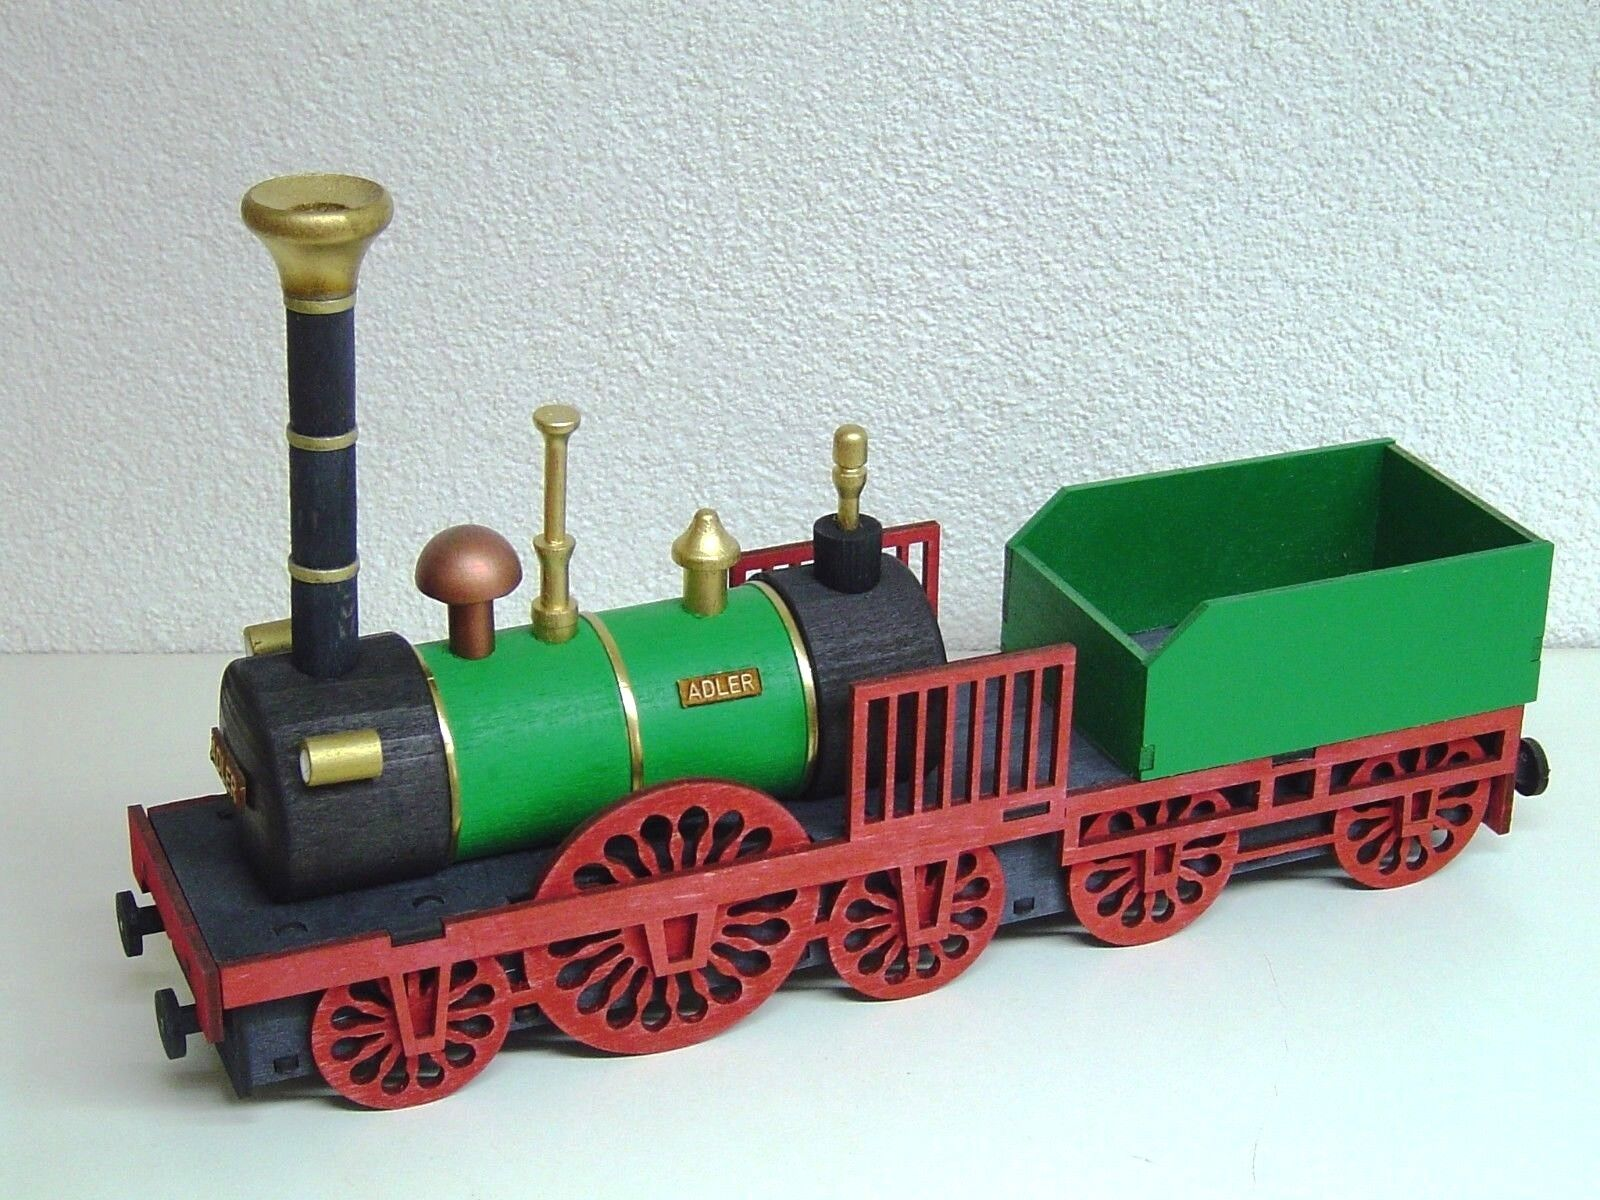 Räucher Lok Adler Dampflok Eisenbahn Eisenbahn Eisenbahn rauchend Original Erzgebirge 27 cm 15064 619322